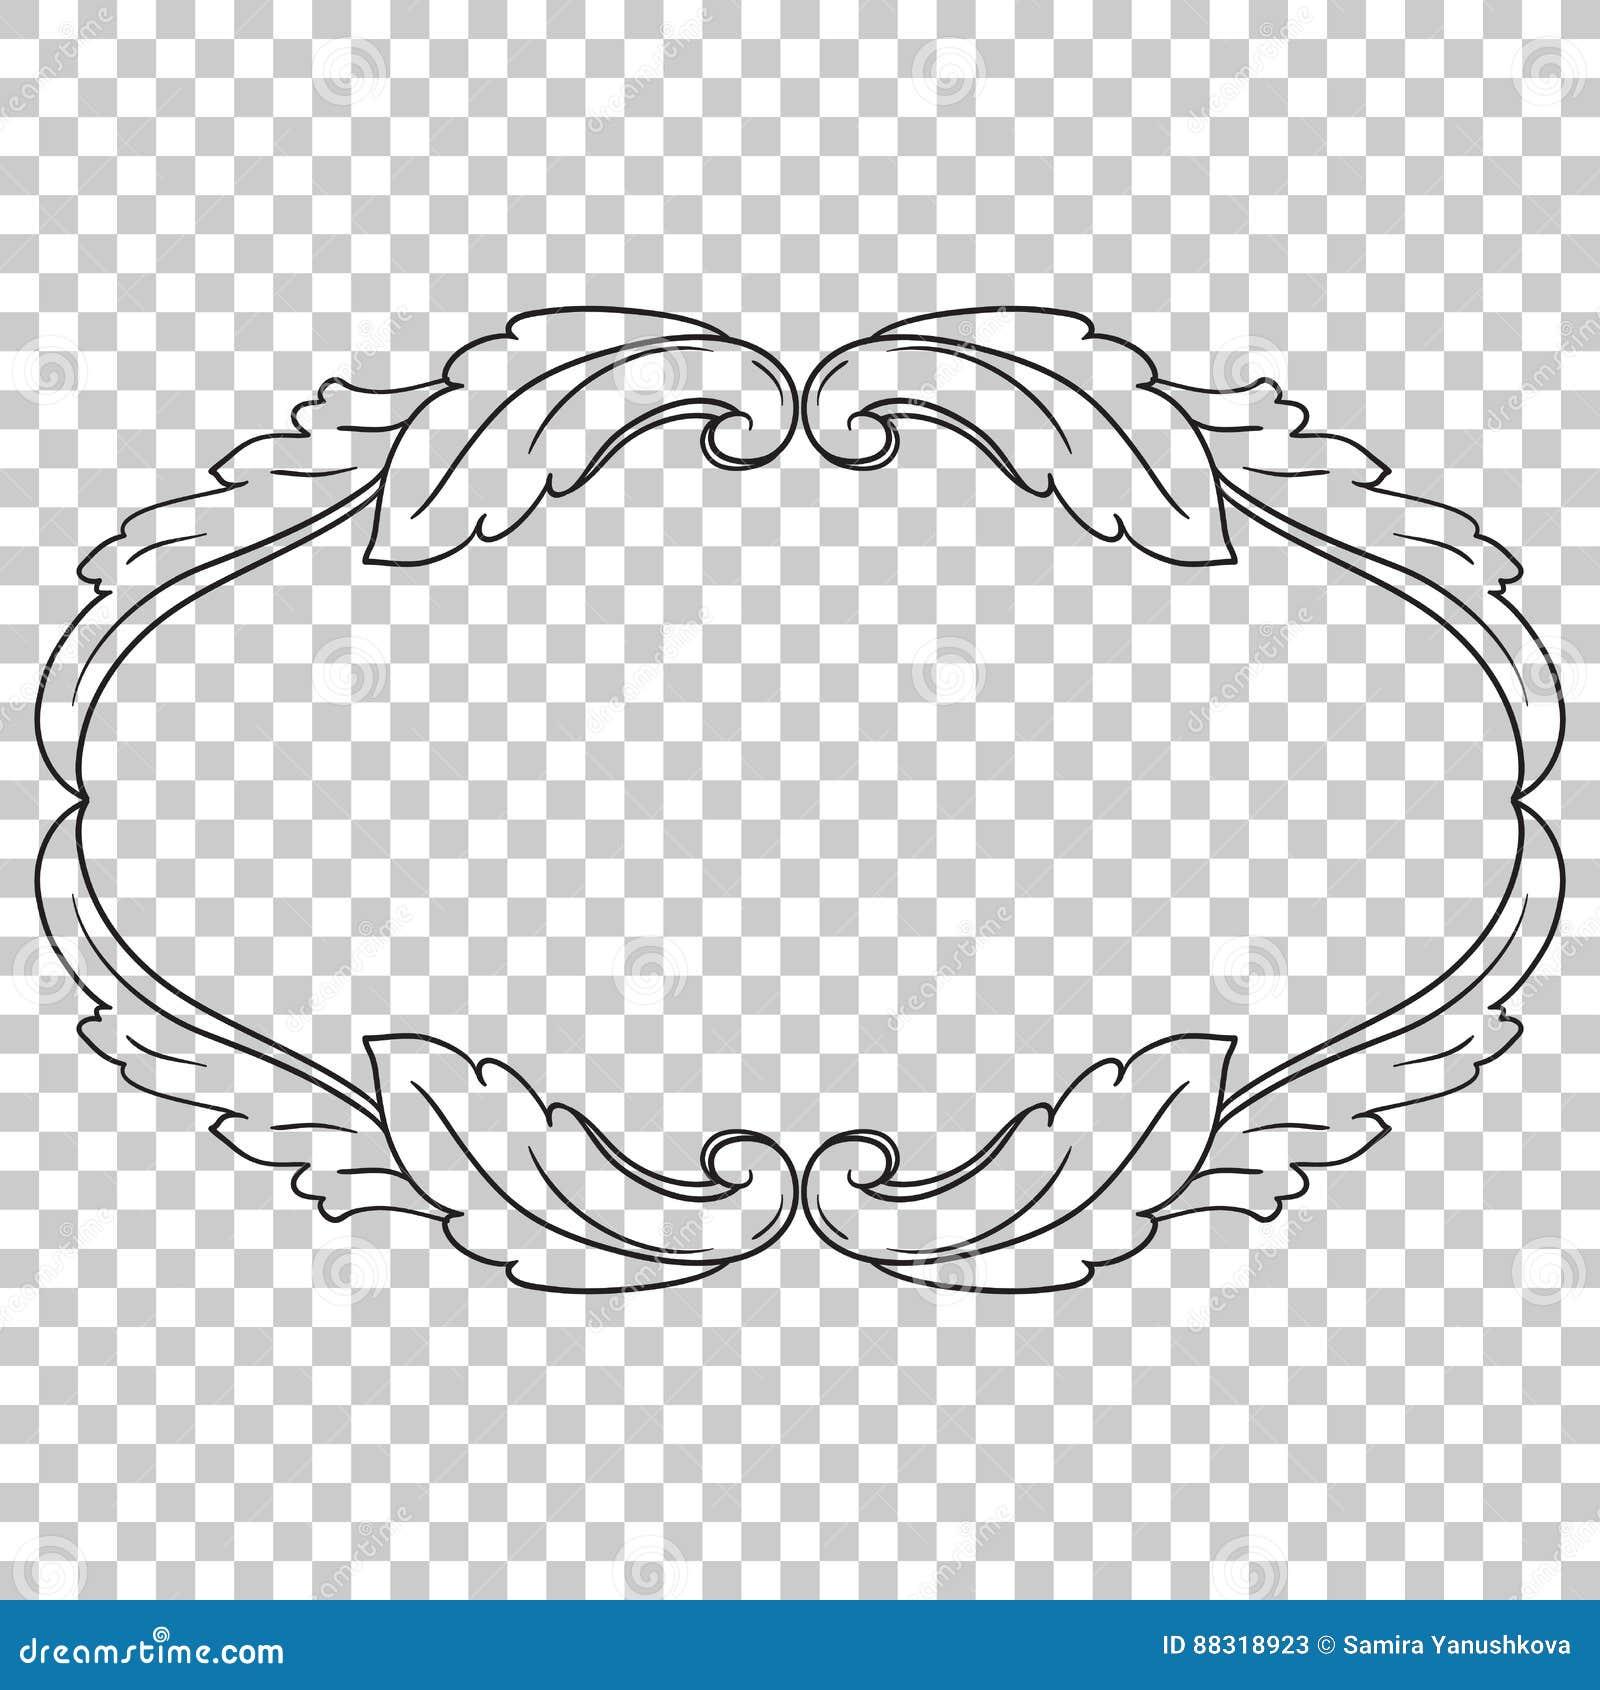 Isoleer ornament in barokke stijl